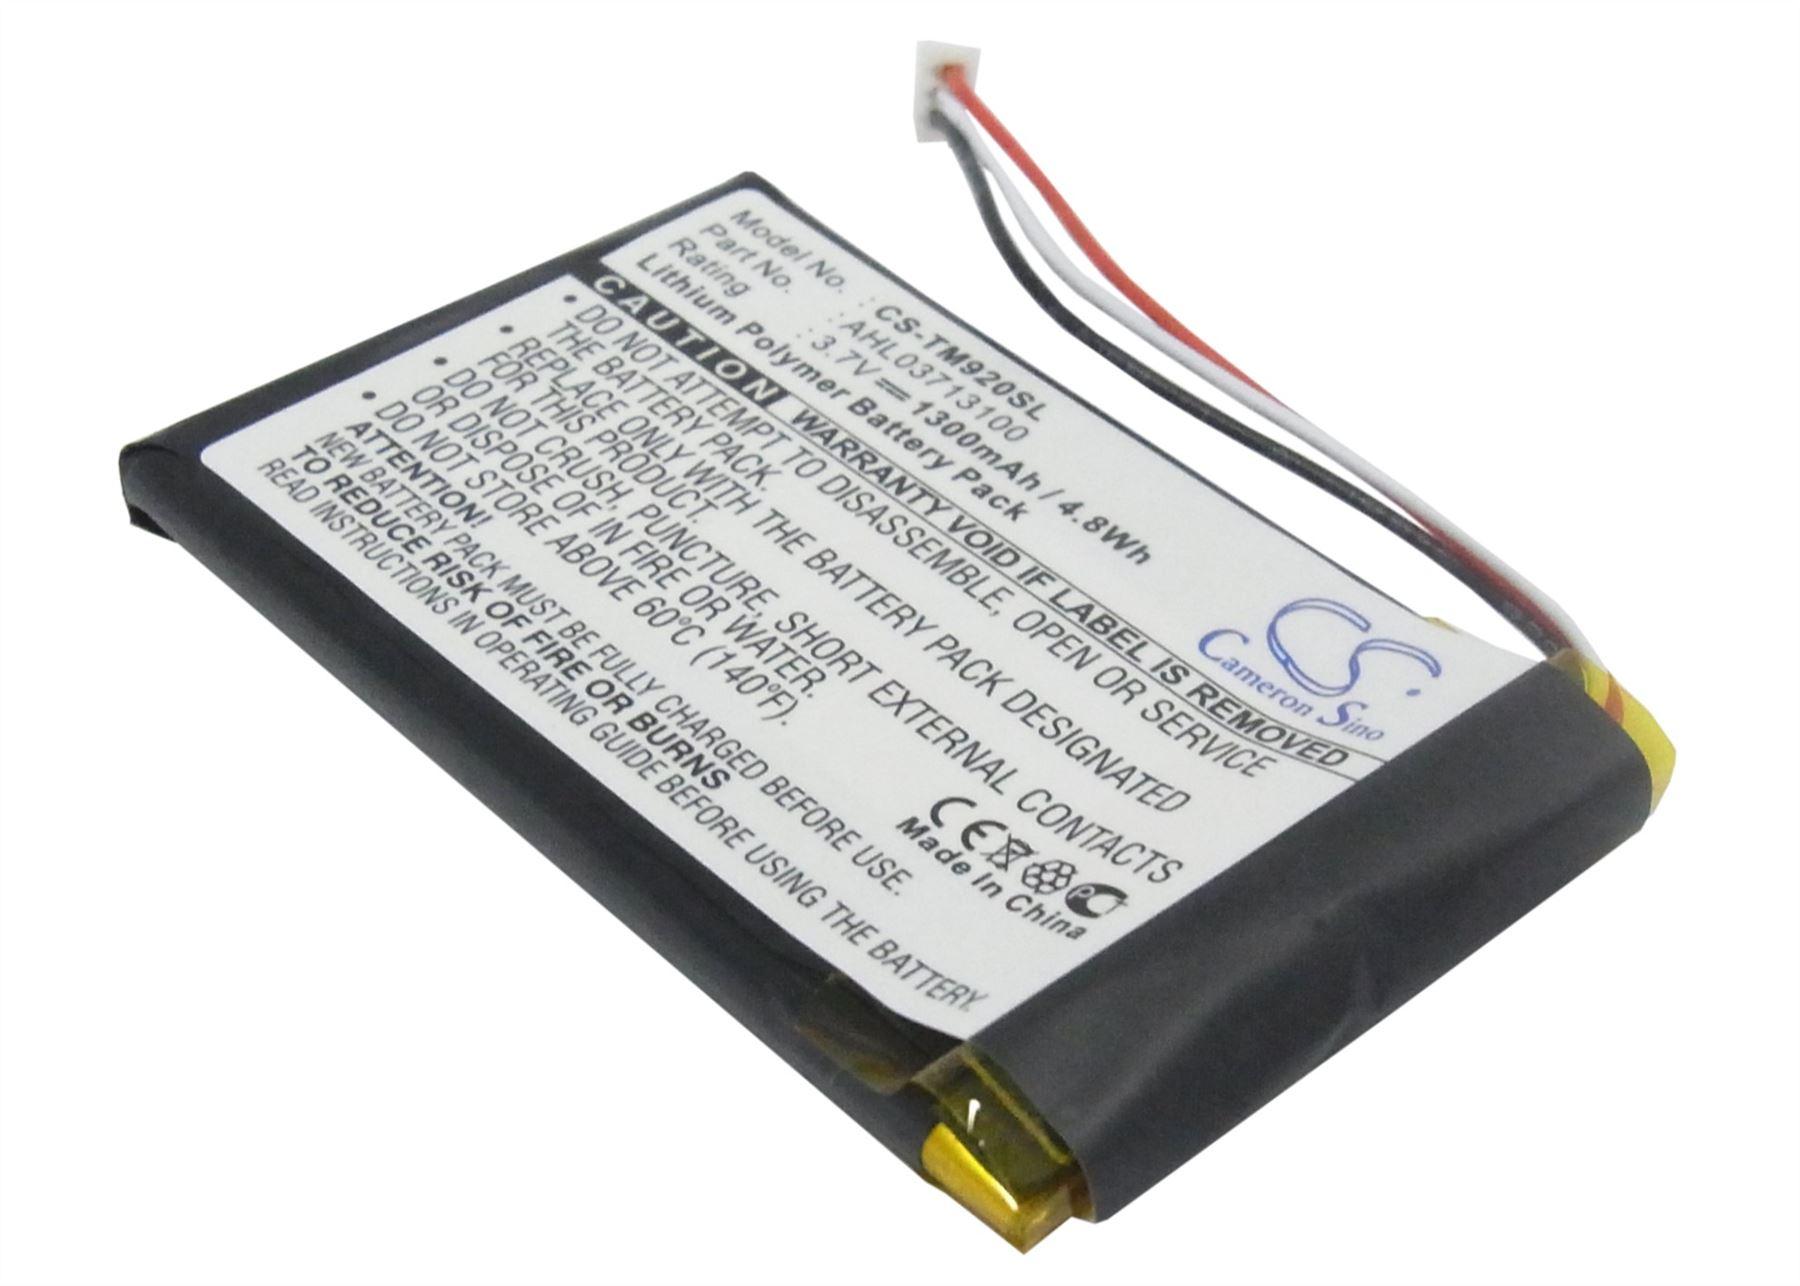 CSTM730SL Go 530 Go 520 1300mAh, 3.7V, Lithium -Ion - Also Replaces Go 730 Go 930 Go 930T Go 630 1697461 TomTom Go 720 Battery with Tools CS-TM730SL Go 730T Replacement for TomTom GPS Batteries Go 530 Live